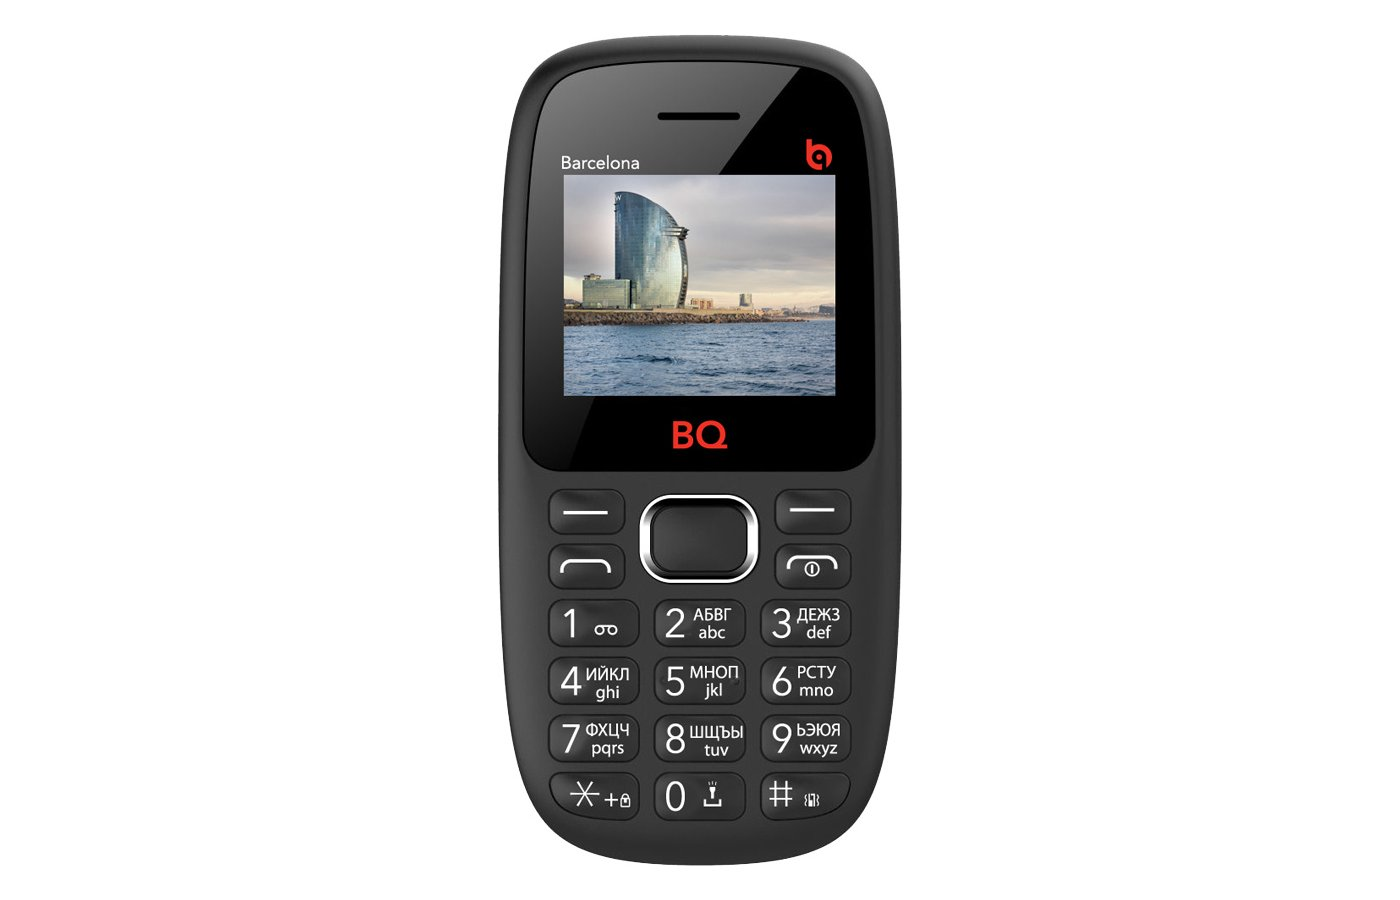 Мобильный телефон BQ BQM-1820 Barcelona Black